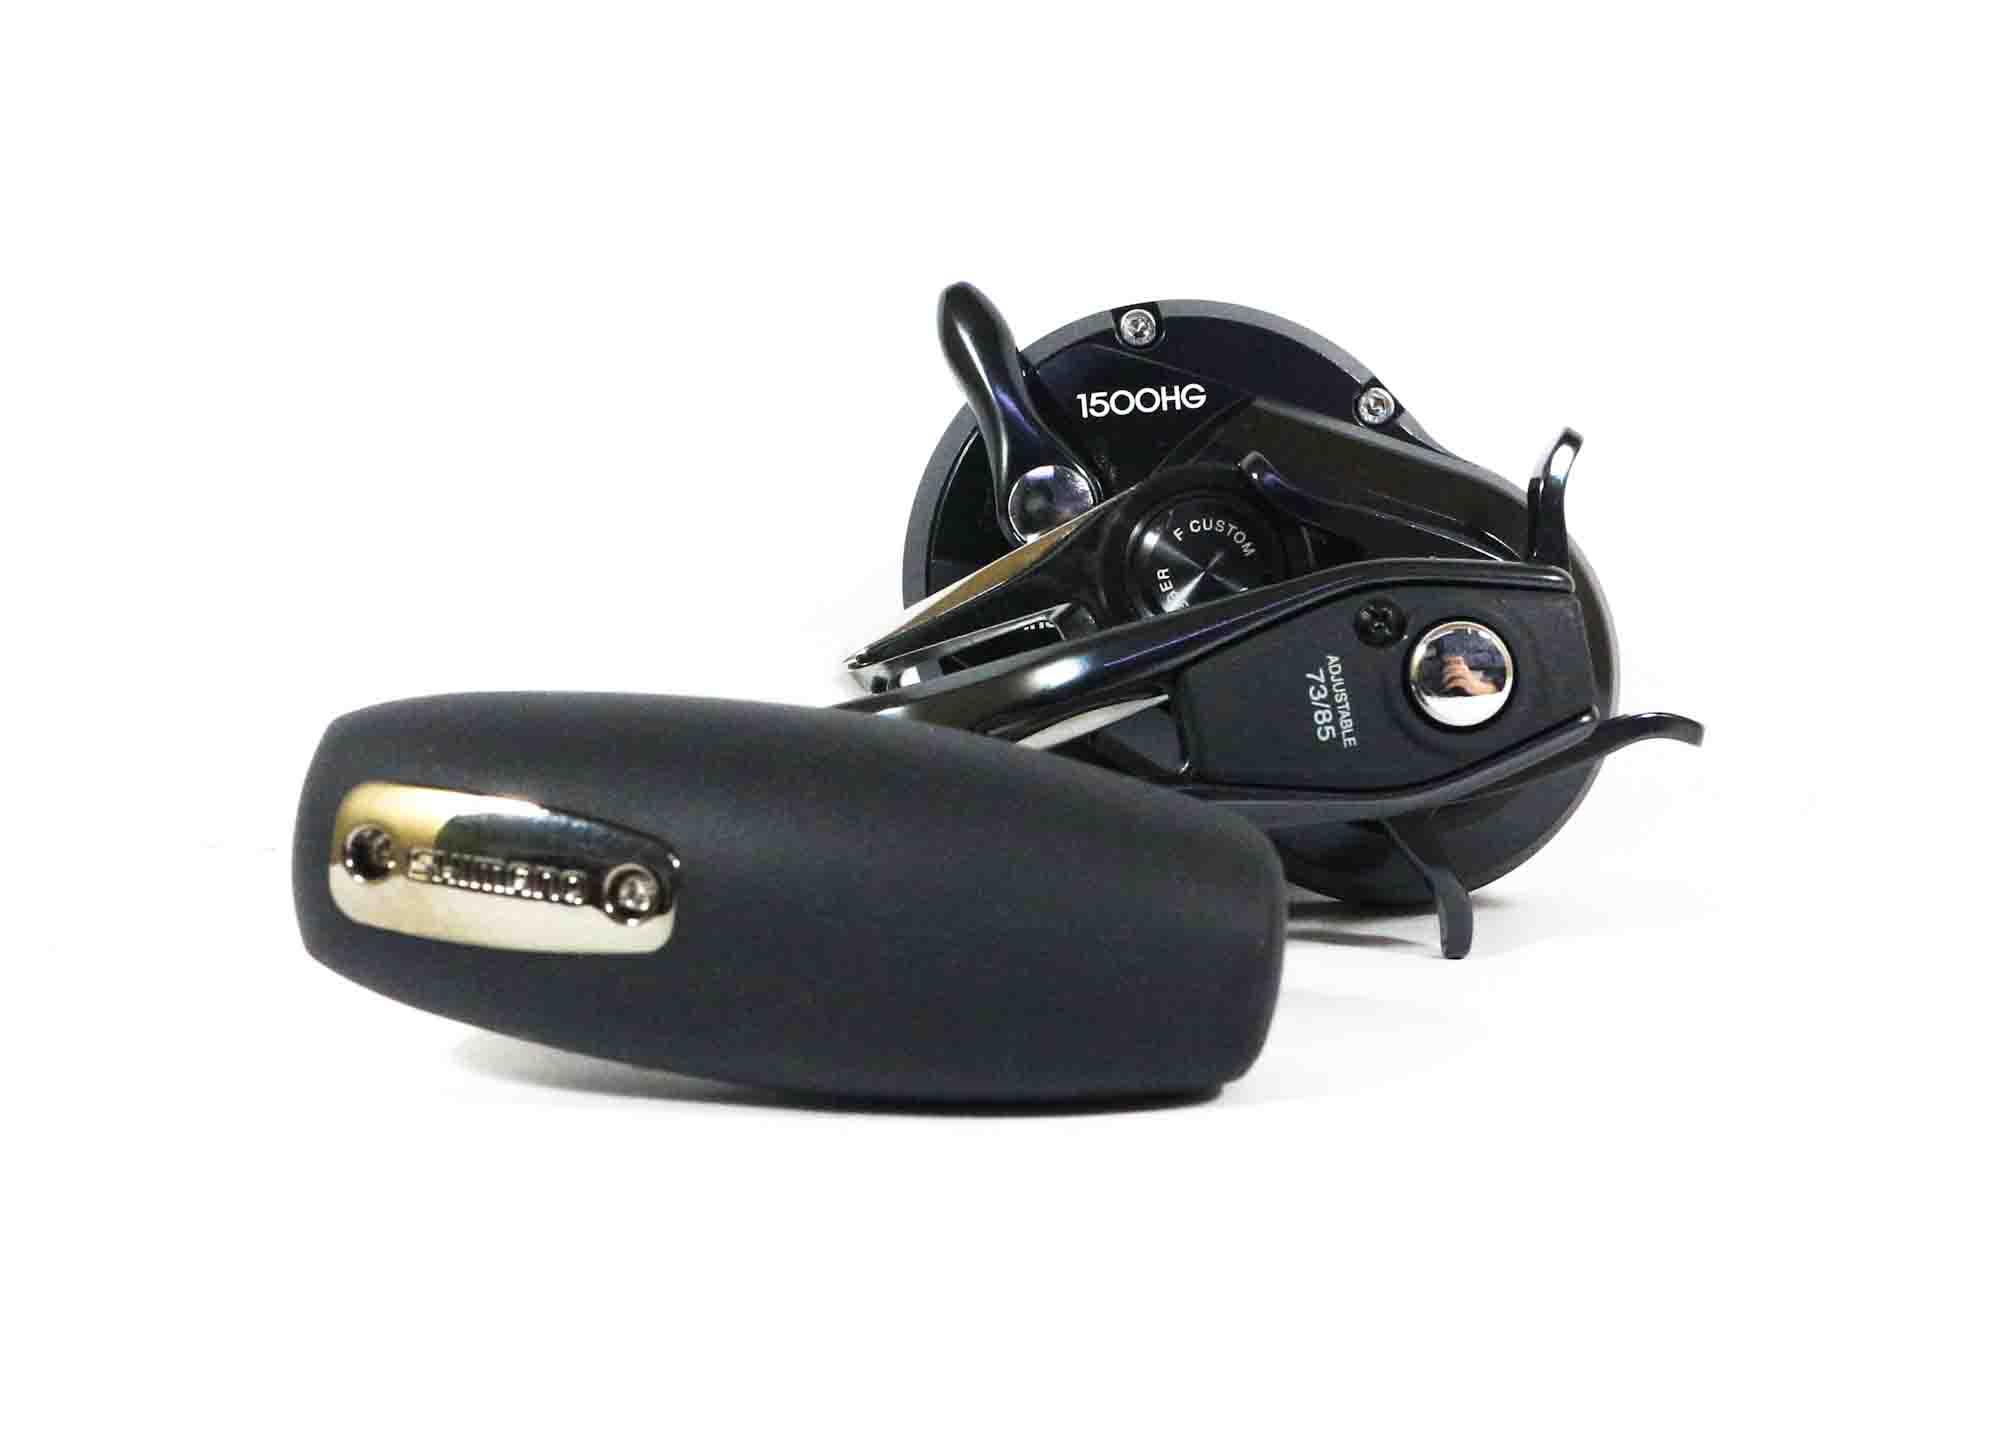 Shimano Reel Baitcast Ocea Jigger F Custom 1501 HG Left Hand (0039)